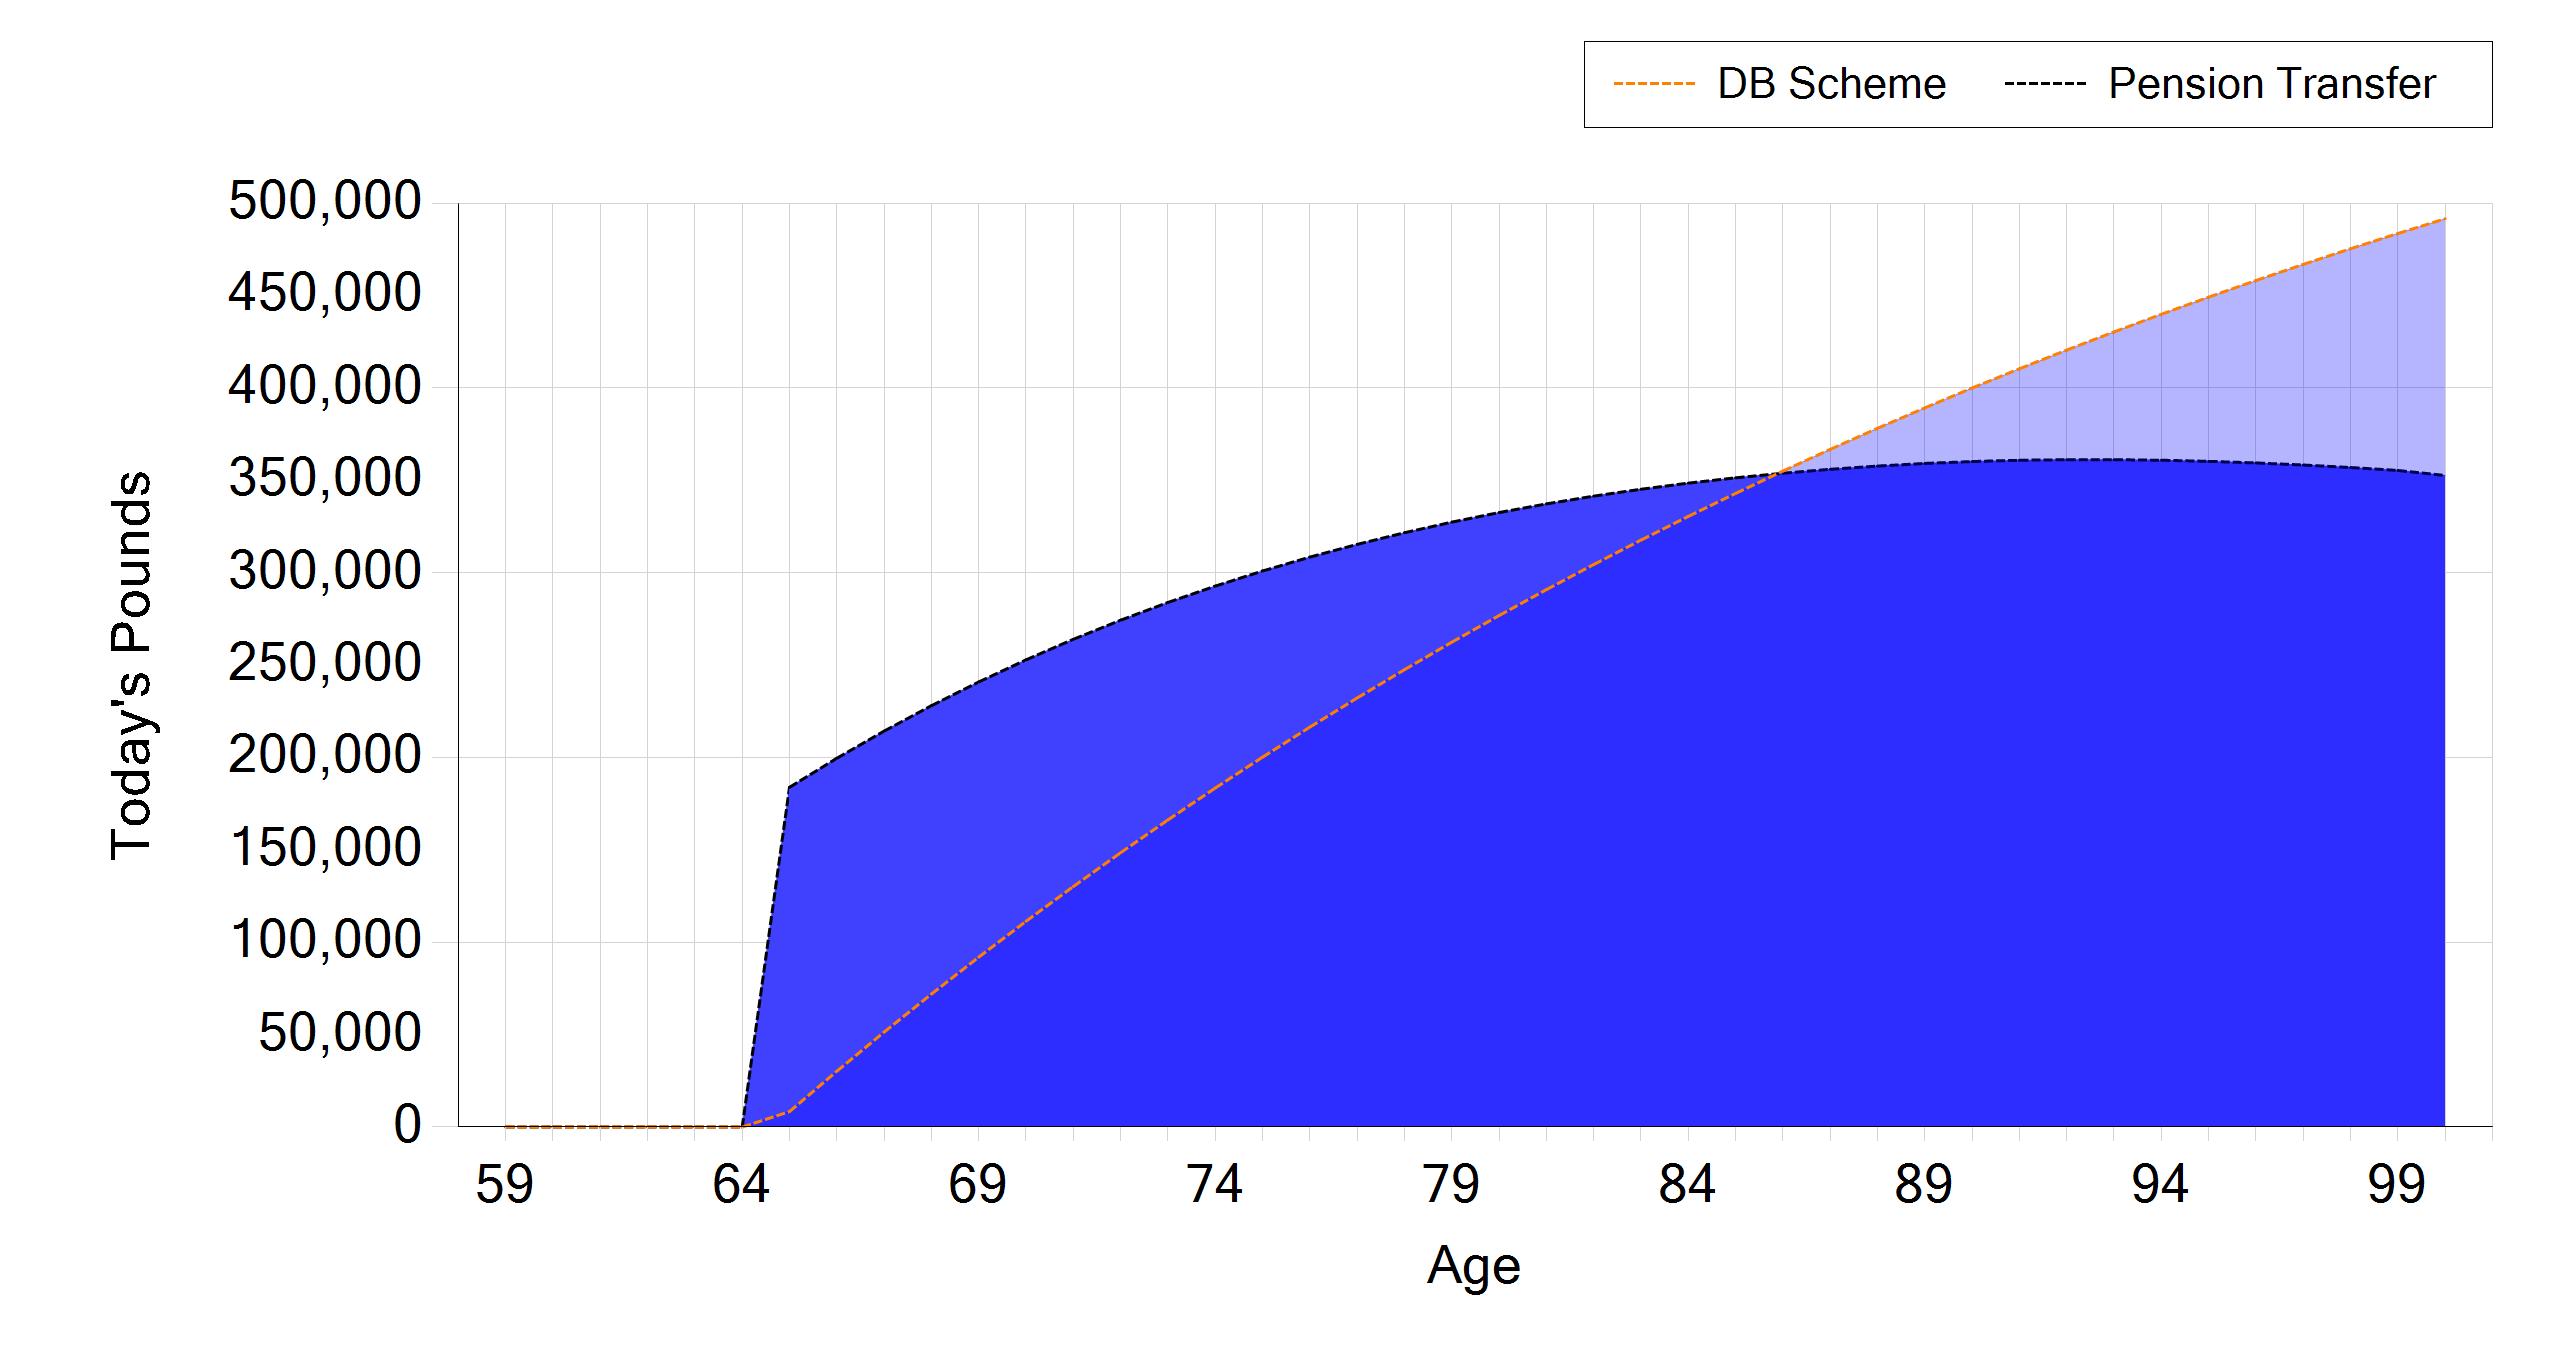 prestwood truth software cashflow modelling cash flow tools apta db pension transfer illustration for bob overlay